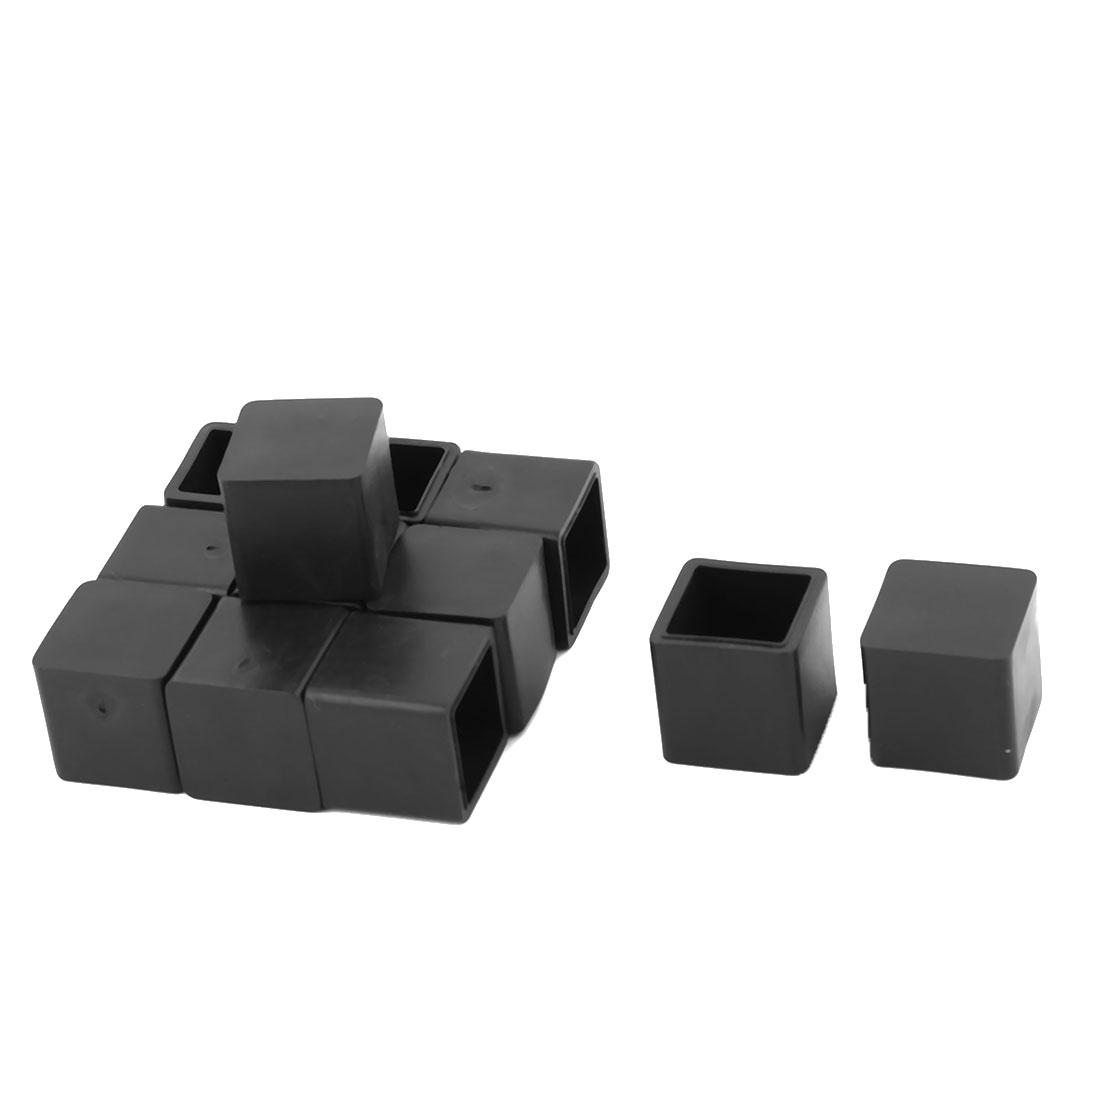 Family Rubber Anti-slip Furniture Chair Desk Foot Protector Cover Black 12 Pcs